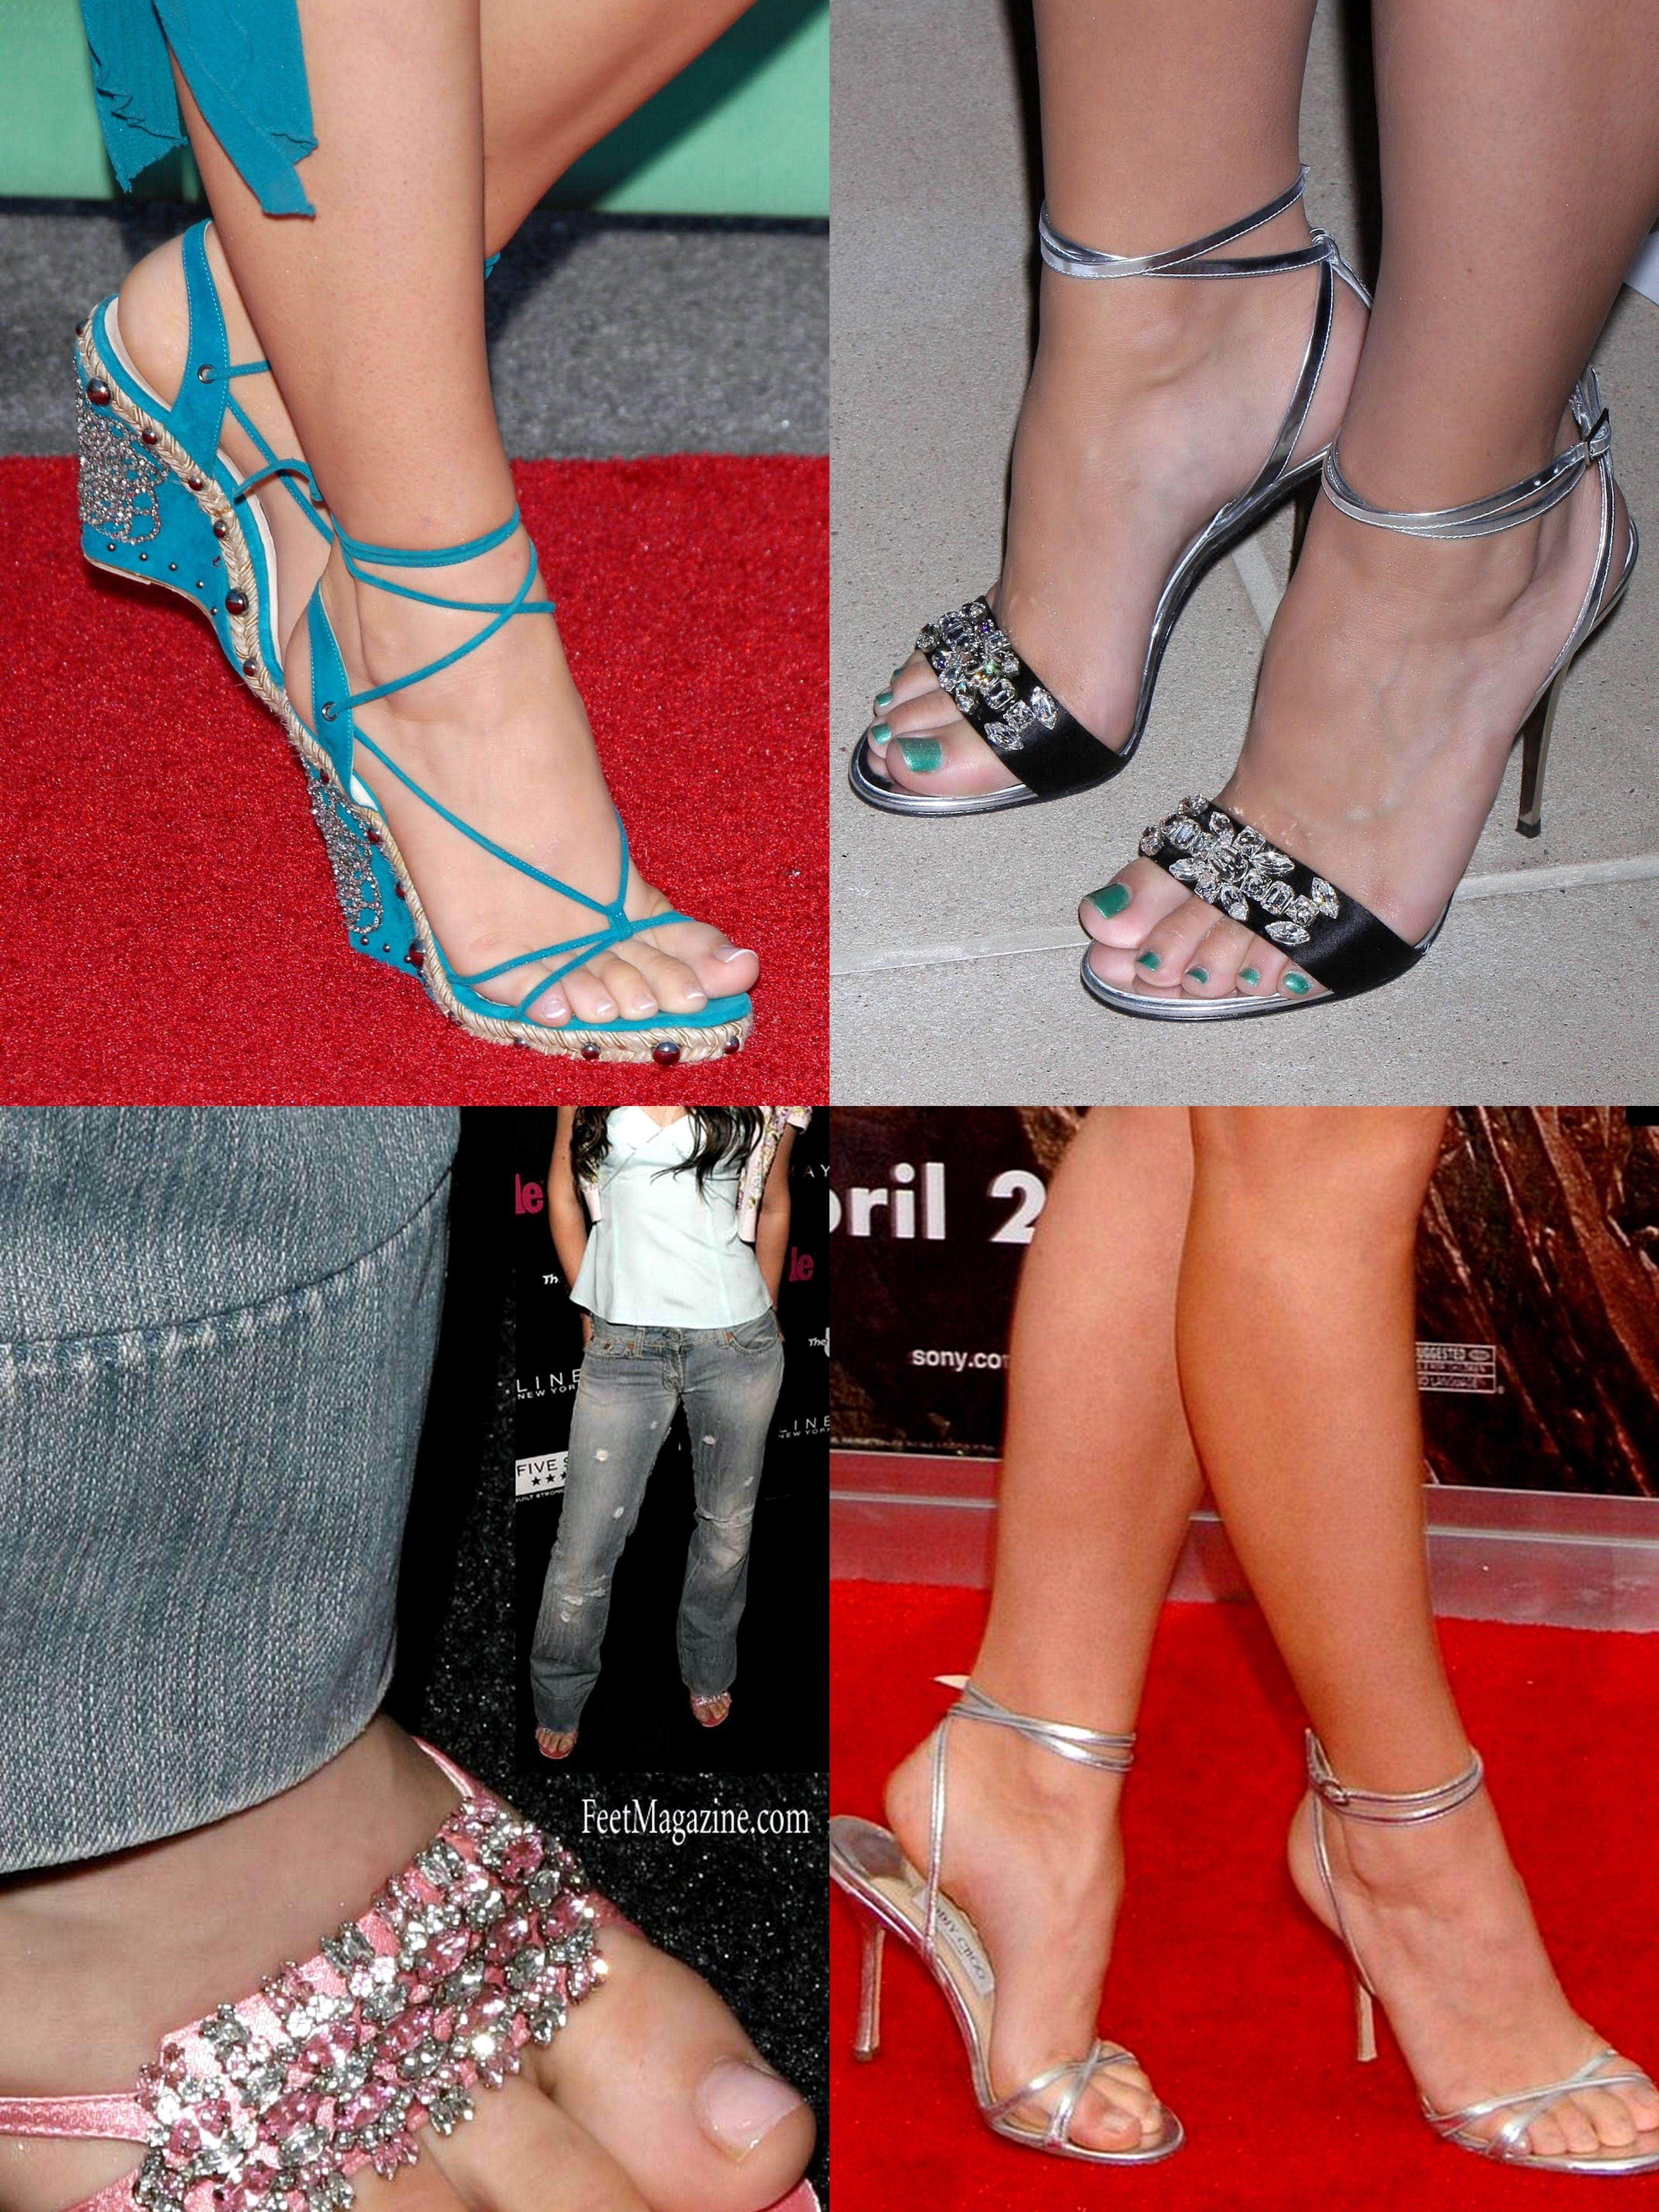 Jojo feet